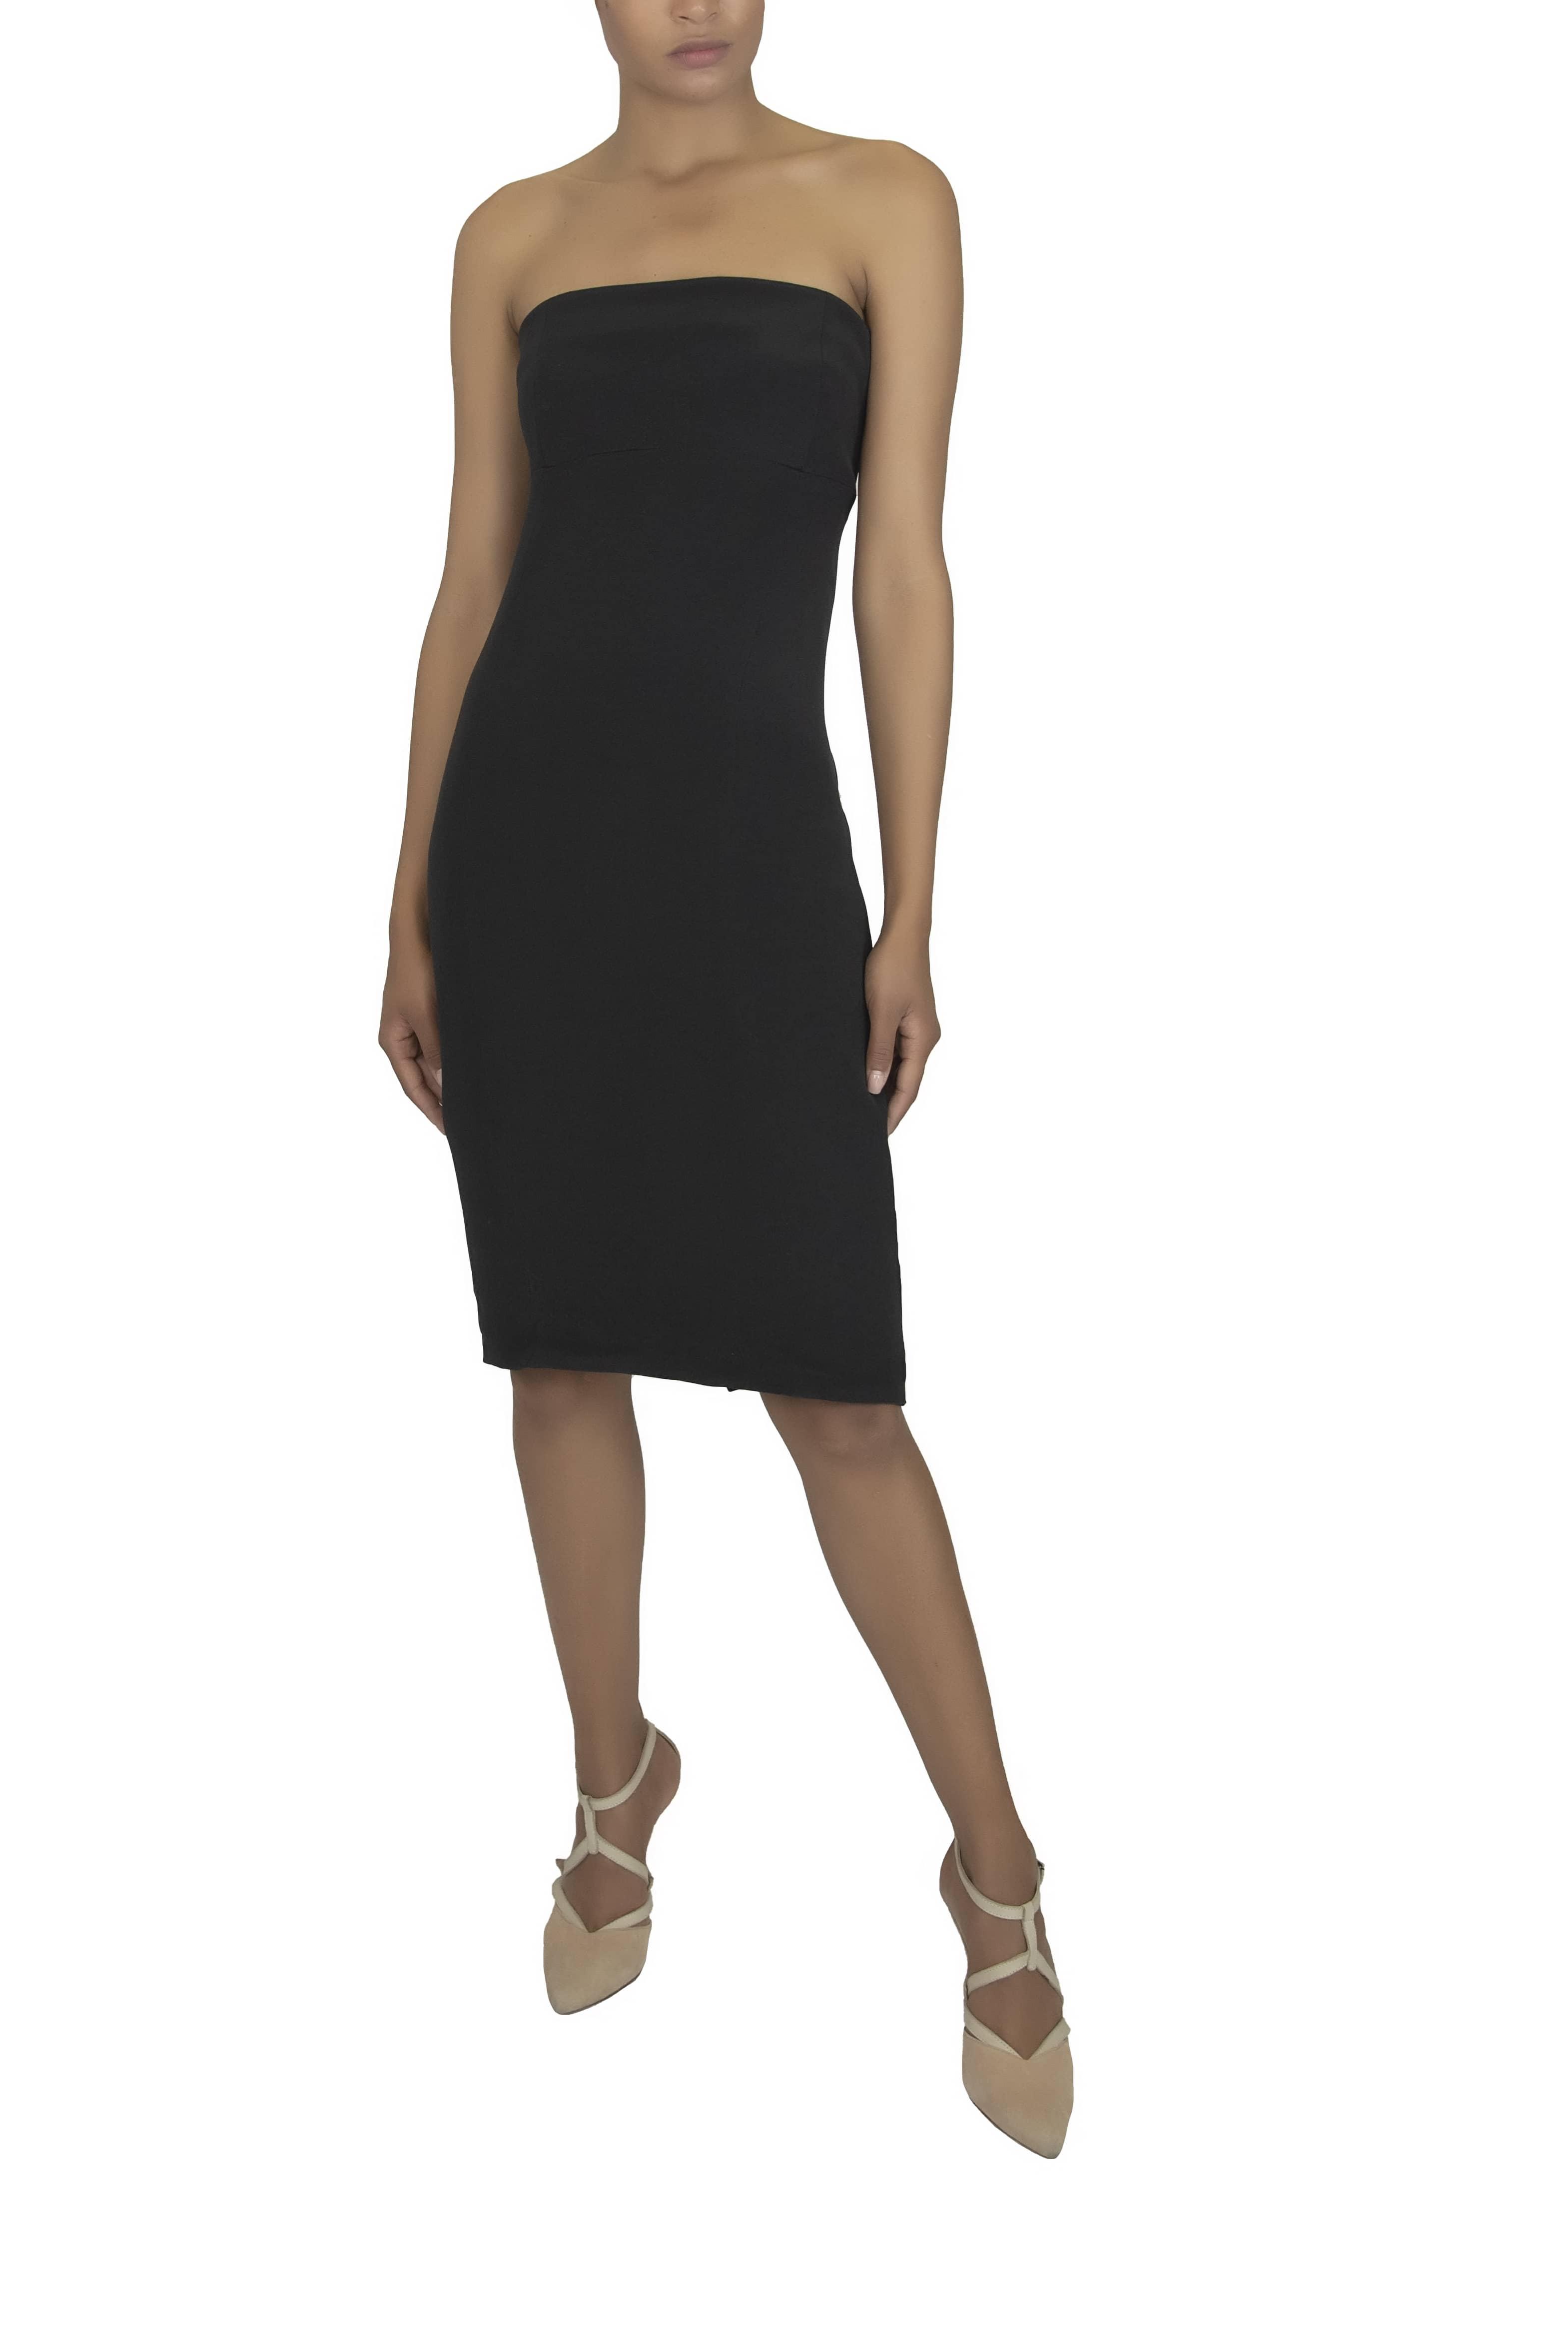 Dress IMAI III 1